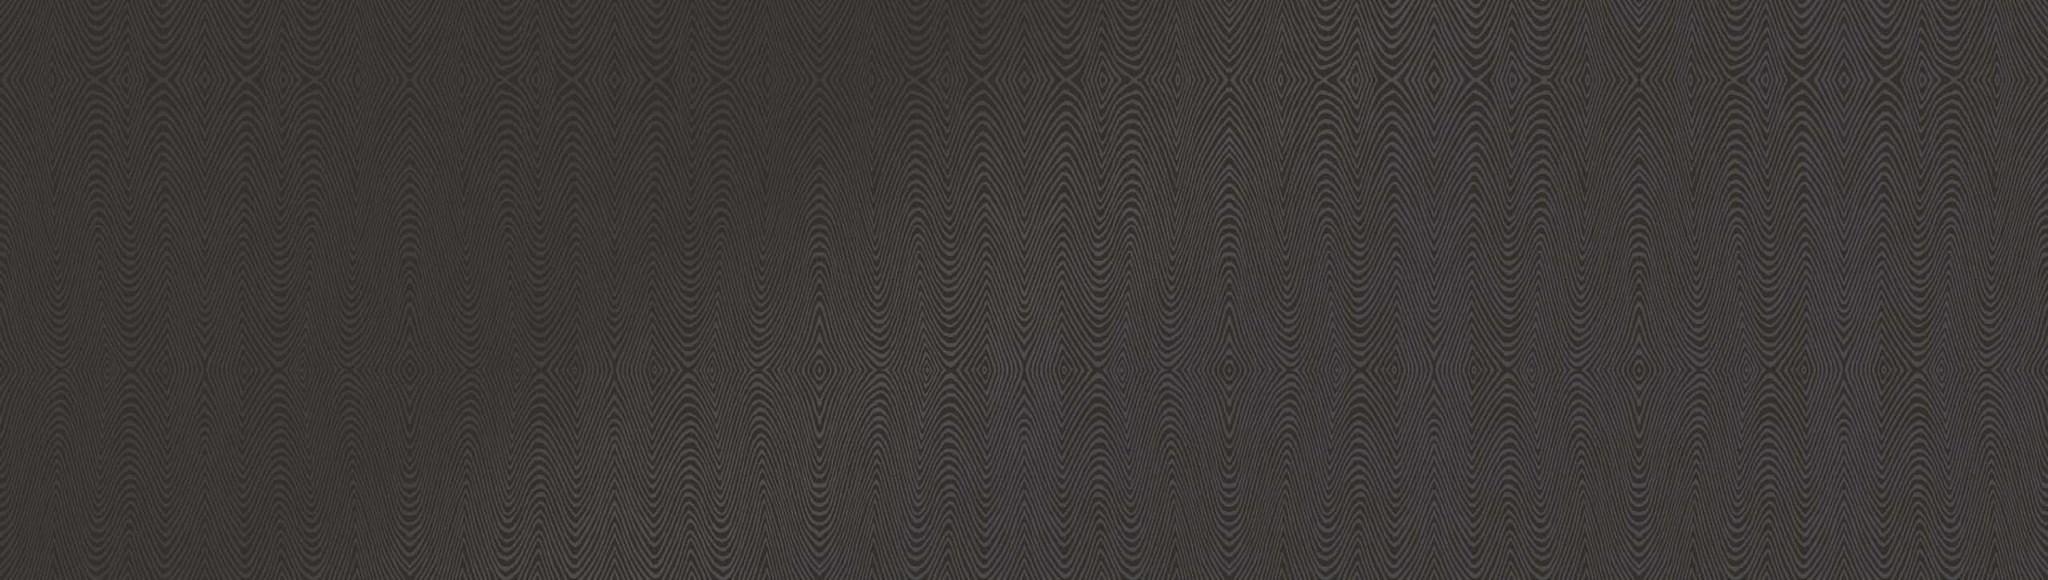 Обои Tiffany Designs Metal Silk MS57, интернет магазин Волео